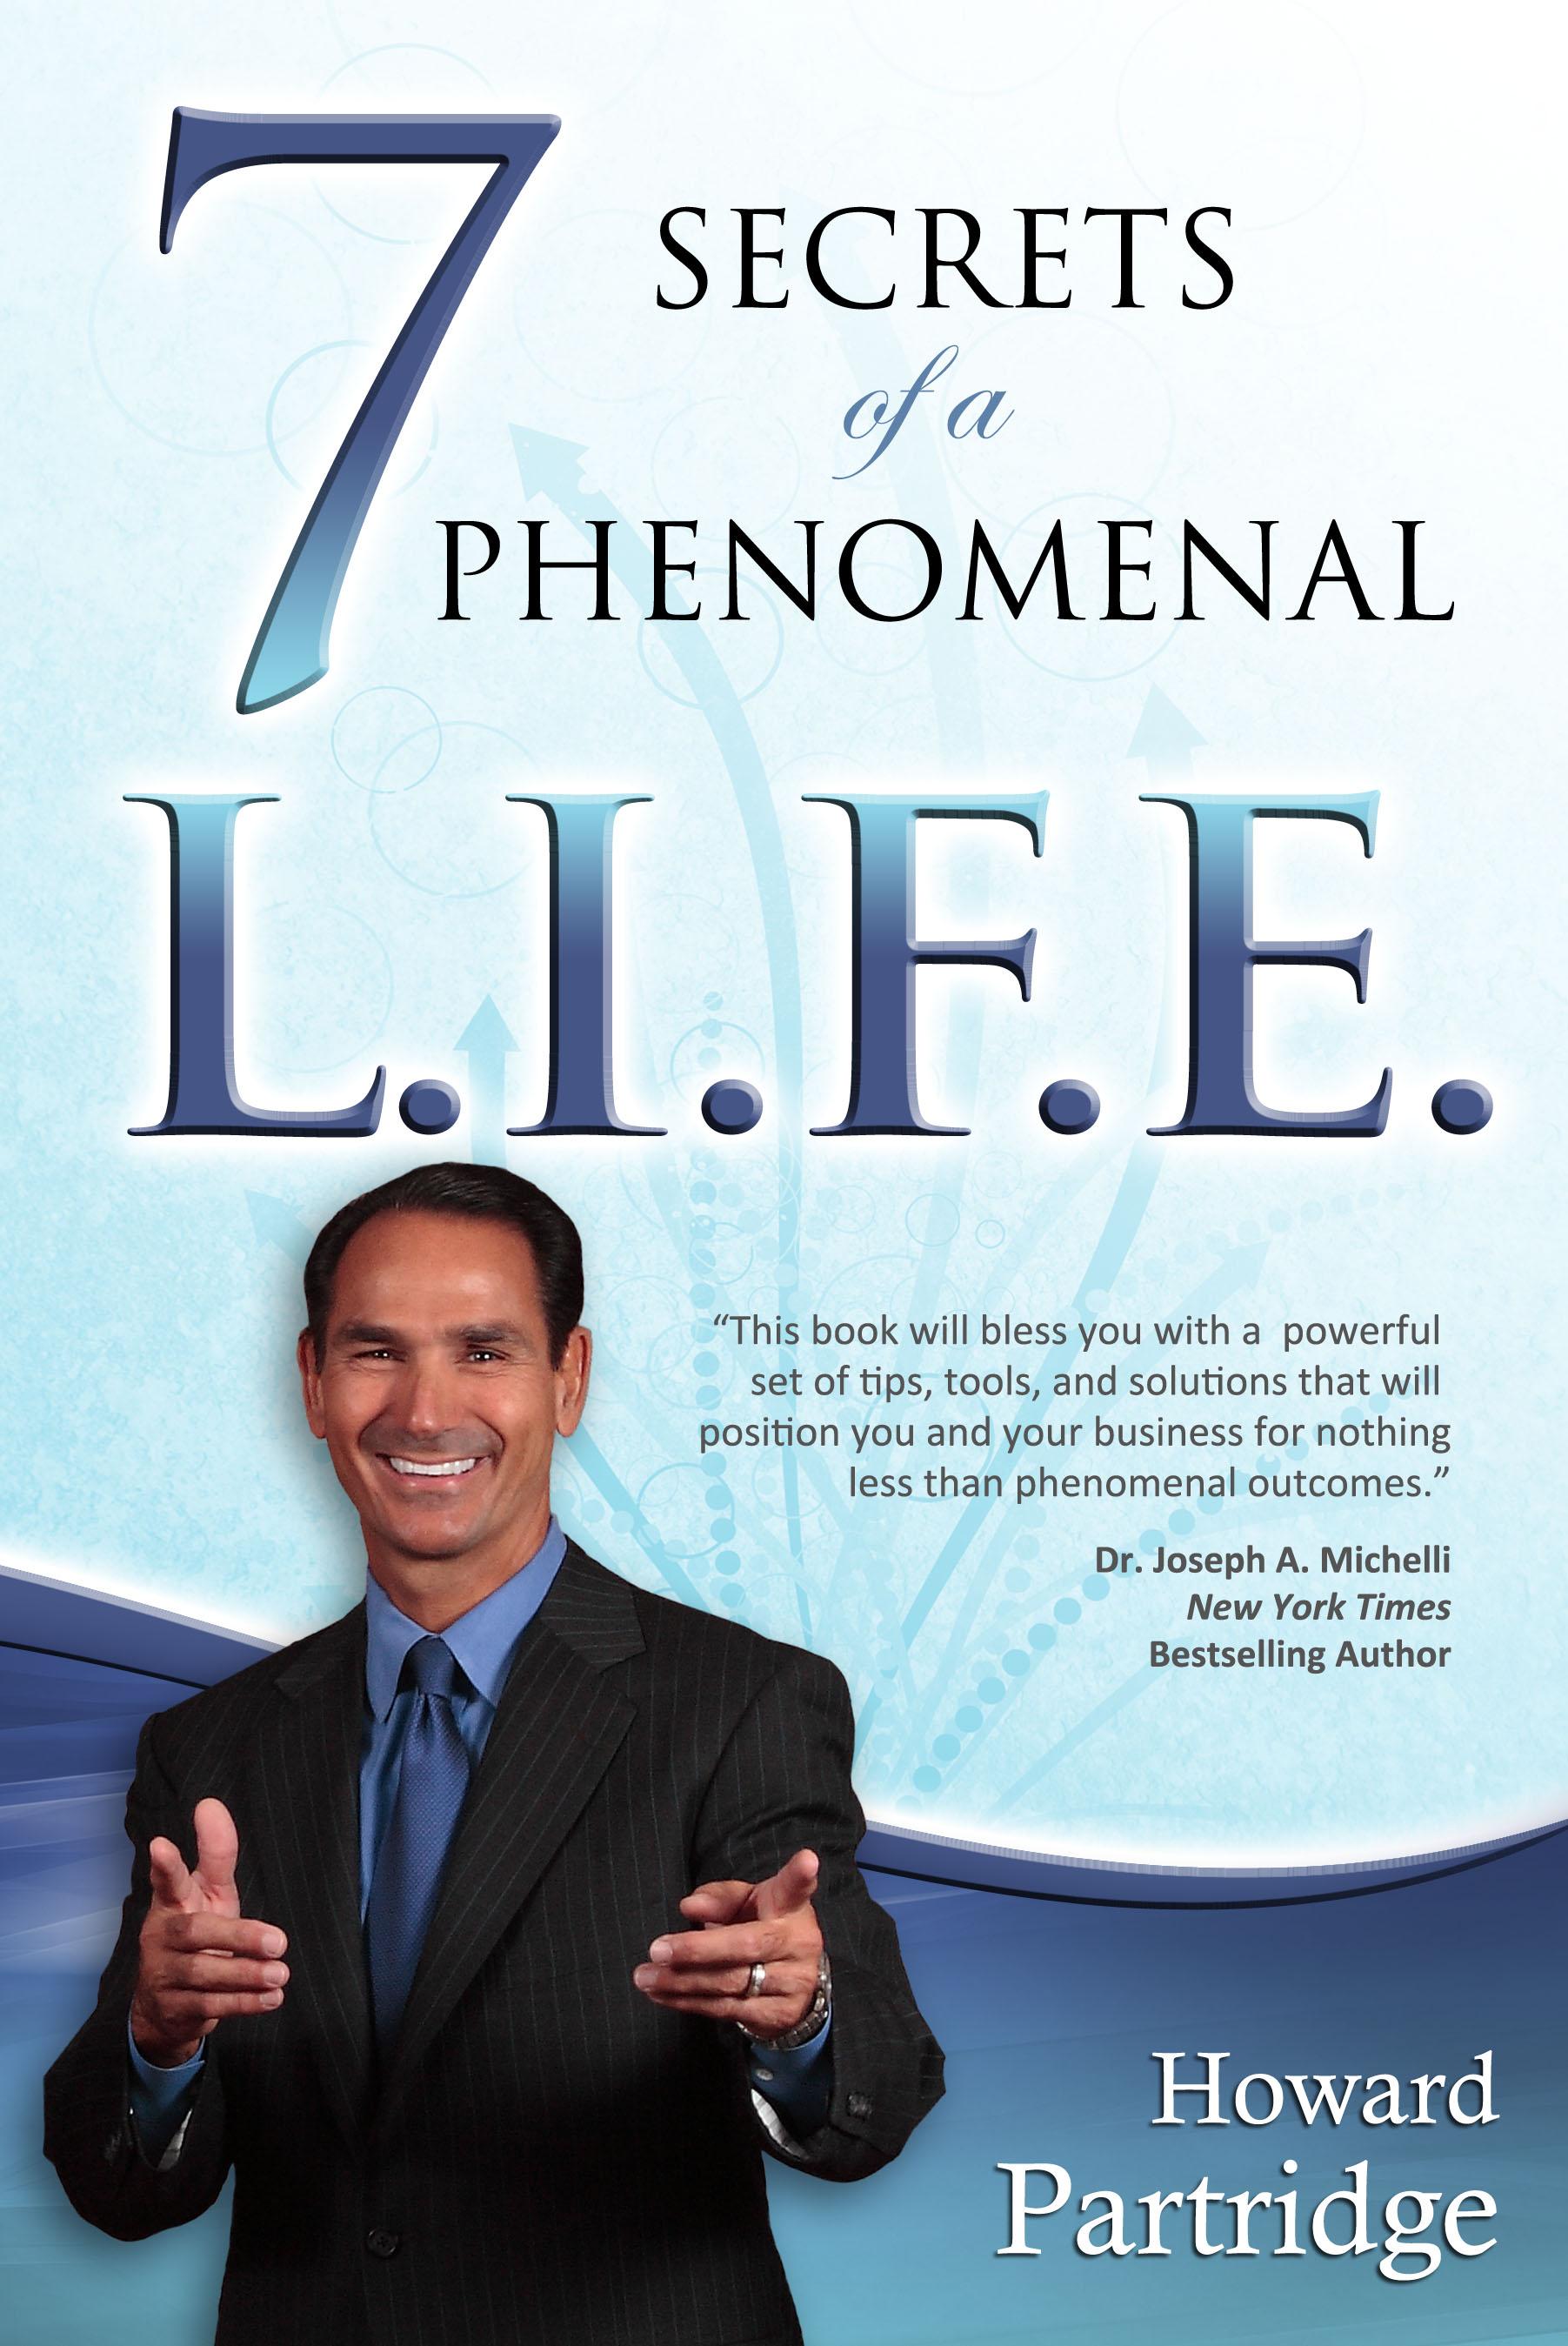 7 Secrets of a Phenomenal L.I.F.E. - Howard Partridge